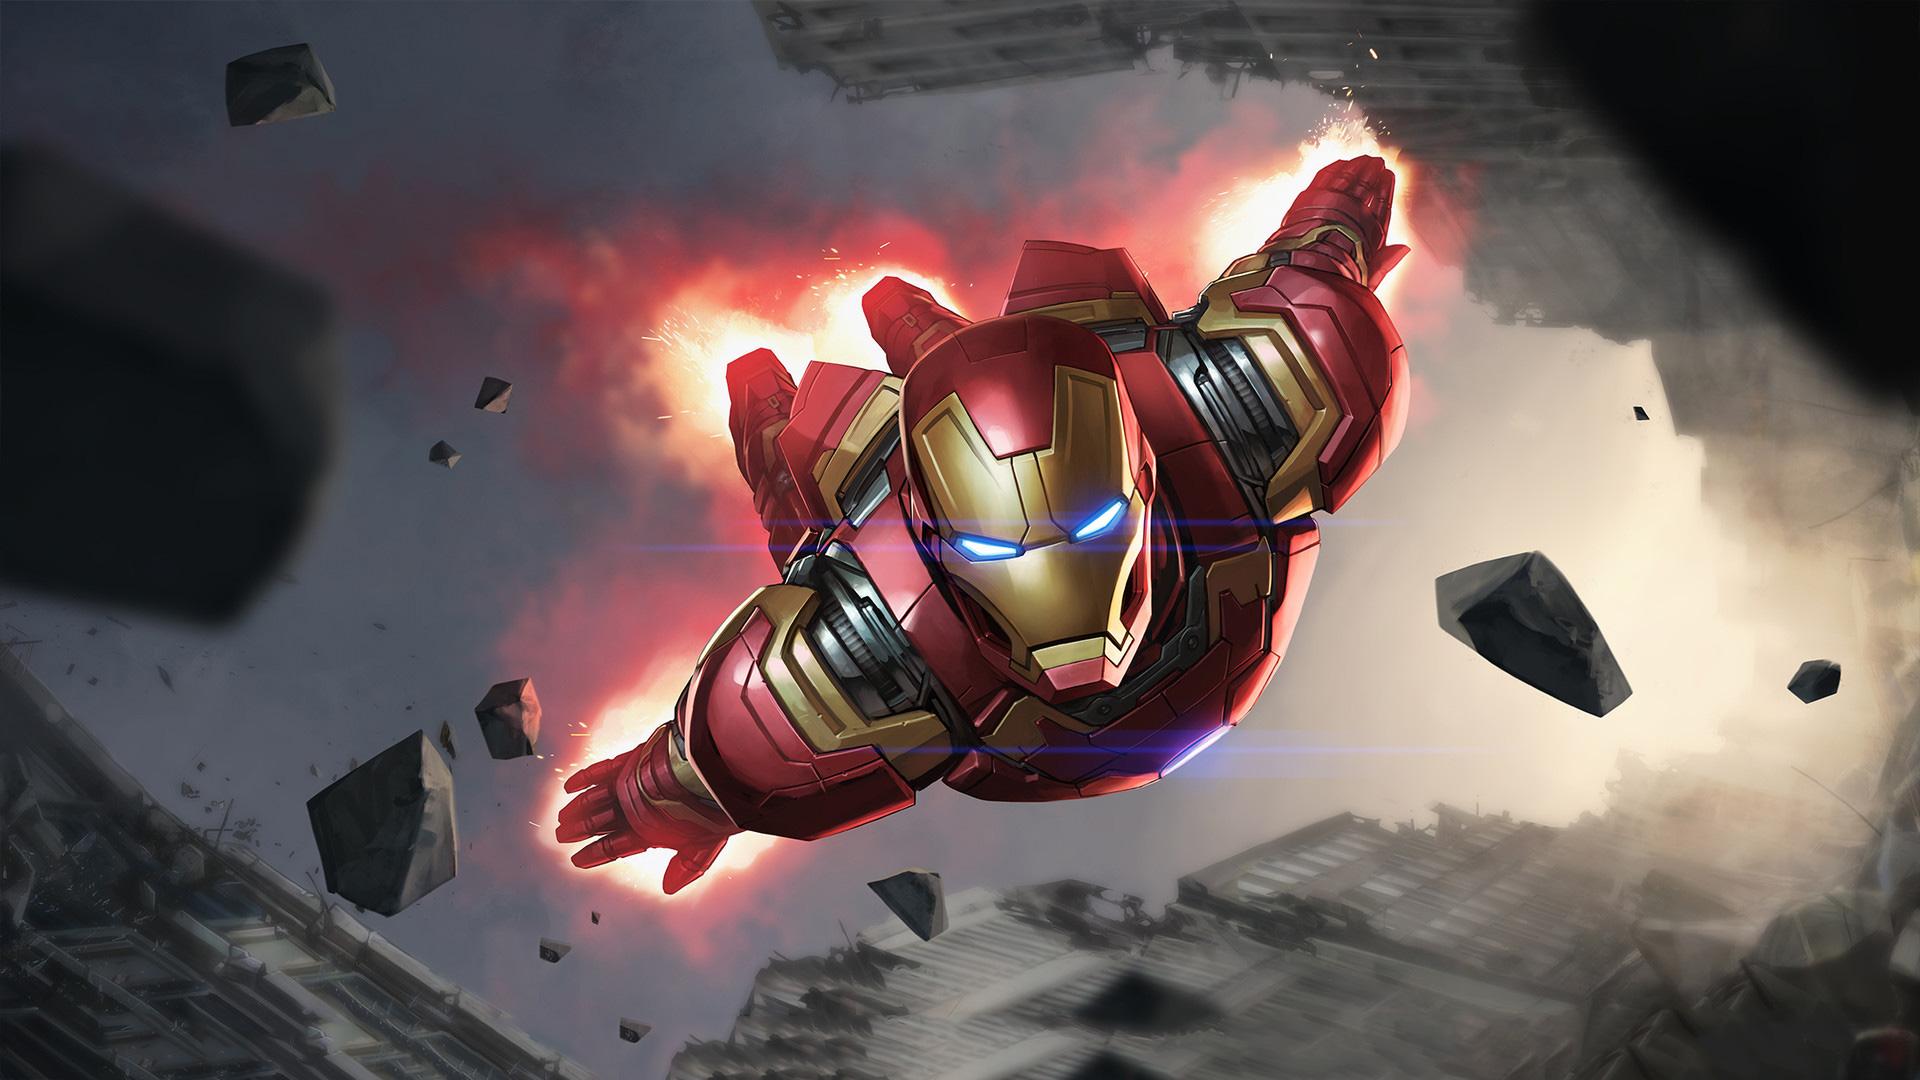 Iron Man Hd Wallpaper Hintergrund 1920x1080 Id973243